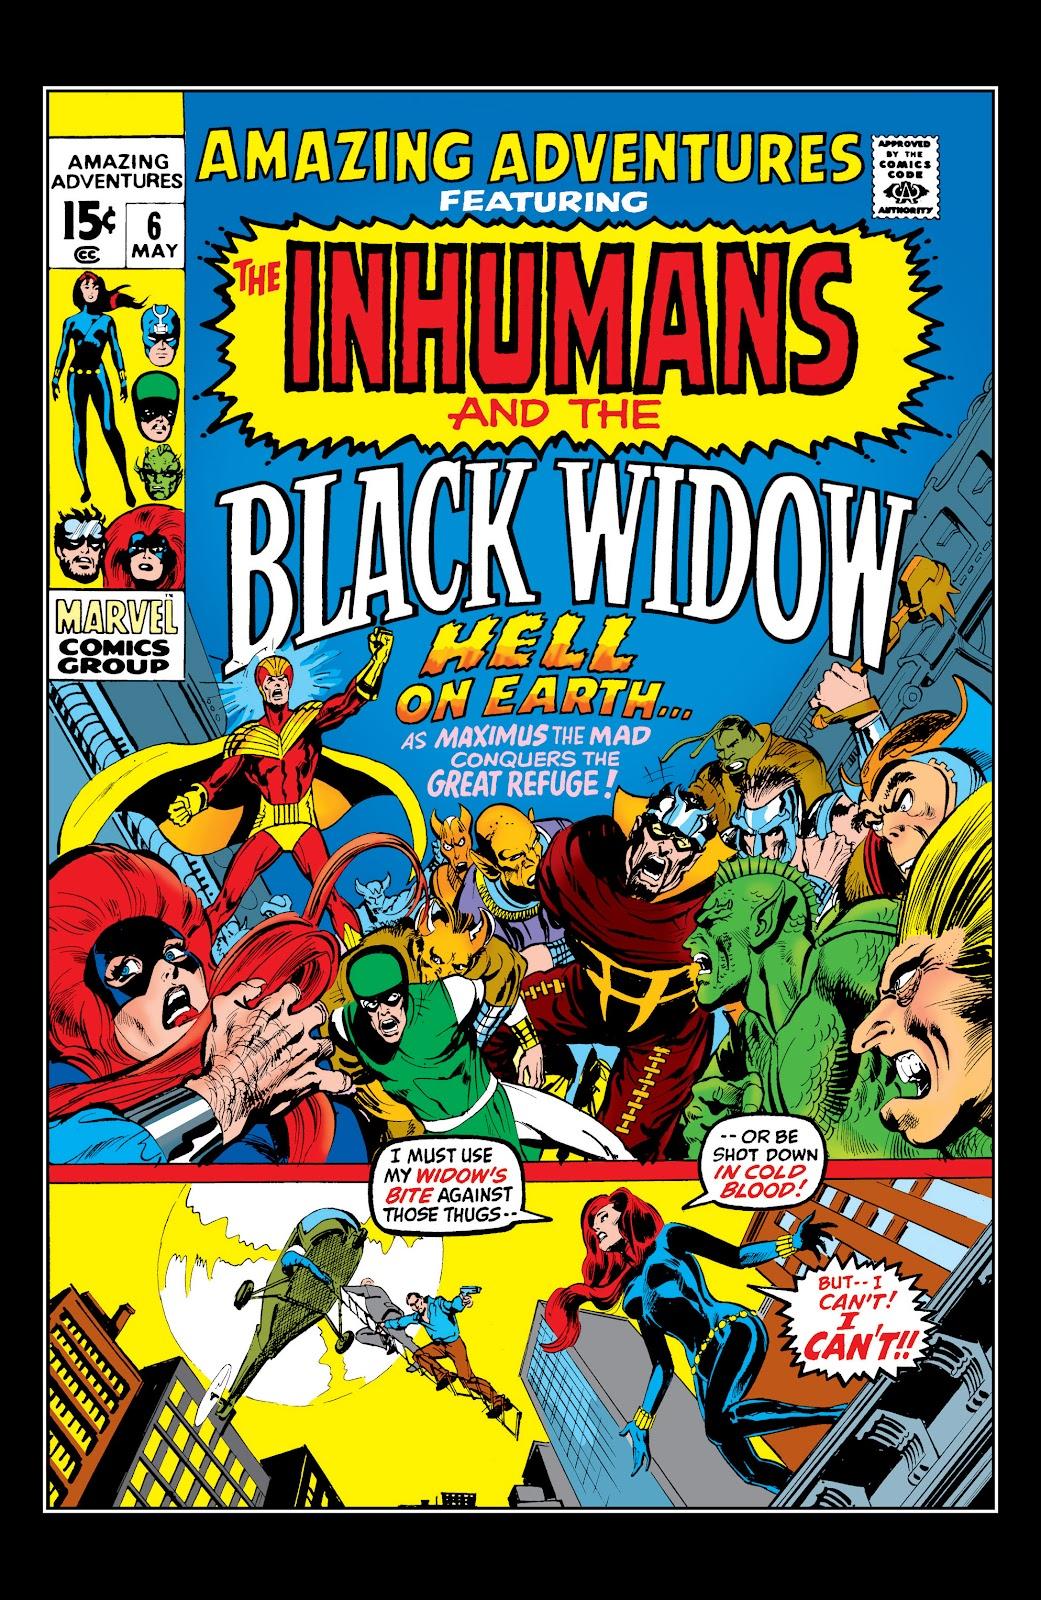 Read online Marvel Masterworks: The Inhumans comic -  Issue # TPB 1 (Part 2) - 24